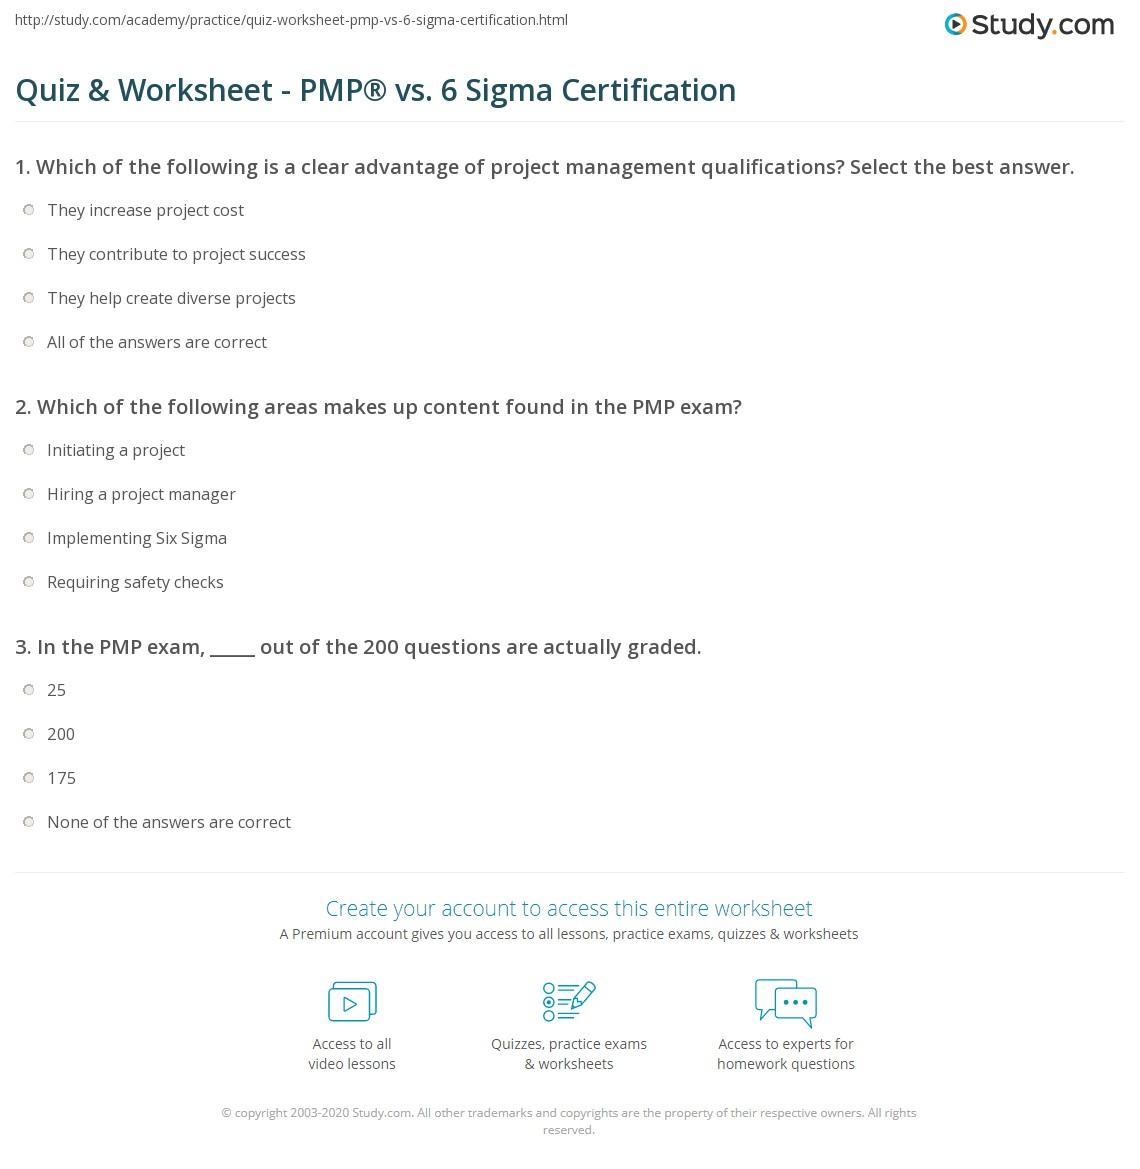 Quiz Worksheet Pmp Vs 6 Sigma Certification Study